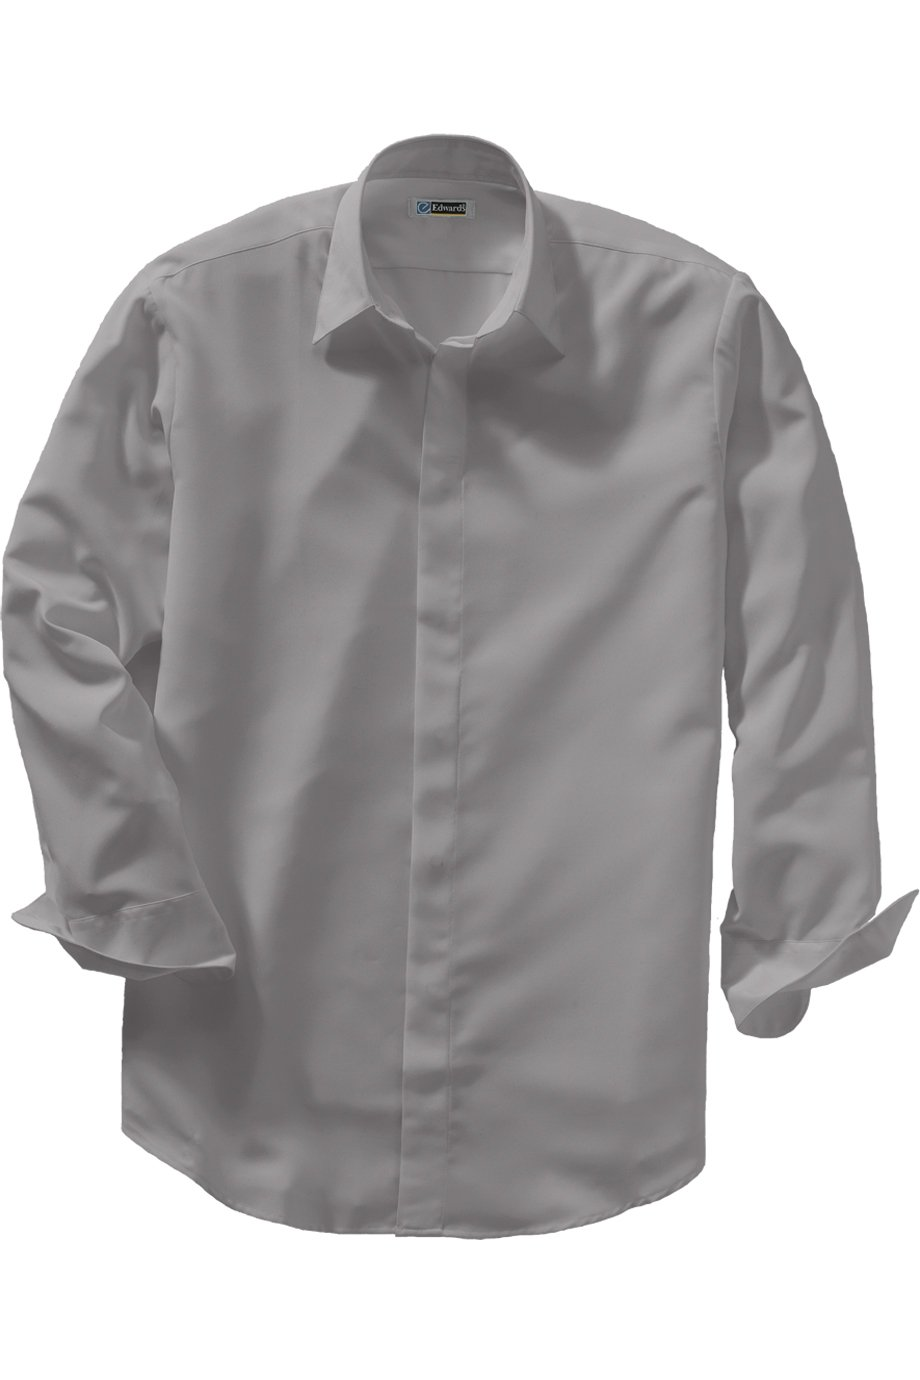 Edwards Garment Men's Big And Tall Adjustable Cuff Cafe Shirt_PLATINUM_XXXXX-Large Tall